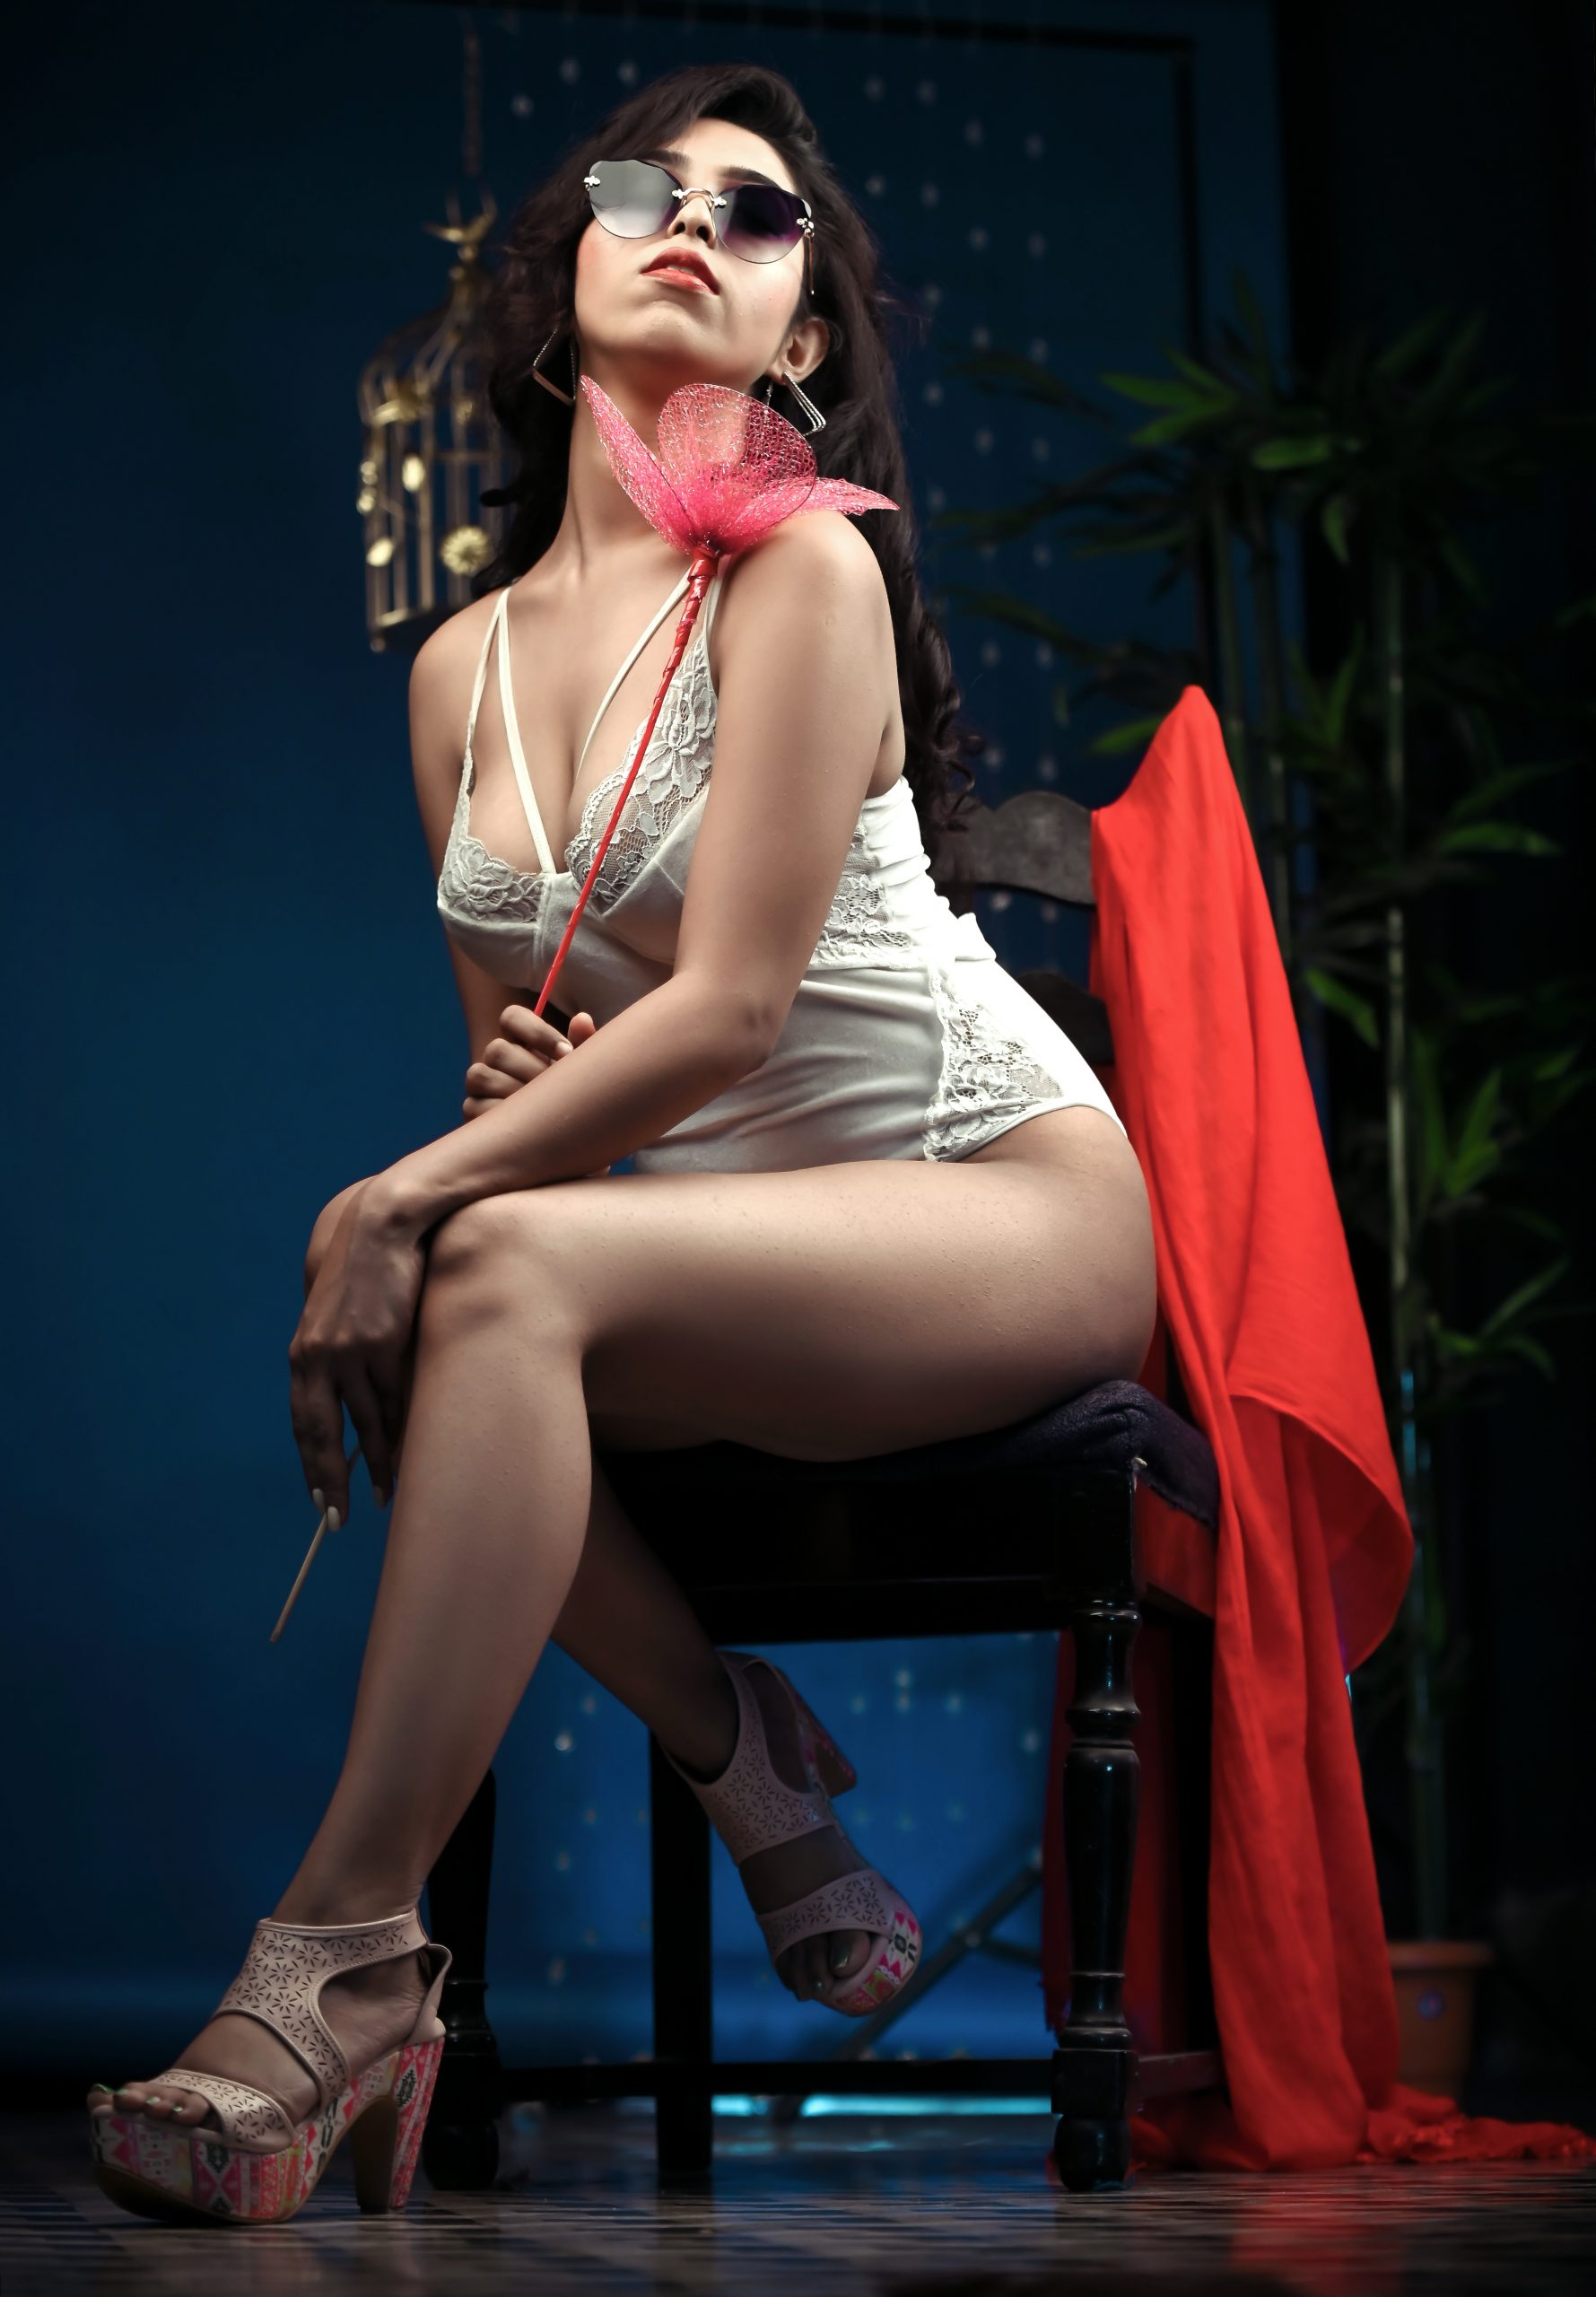 Sexy female model posing